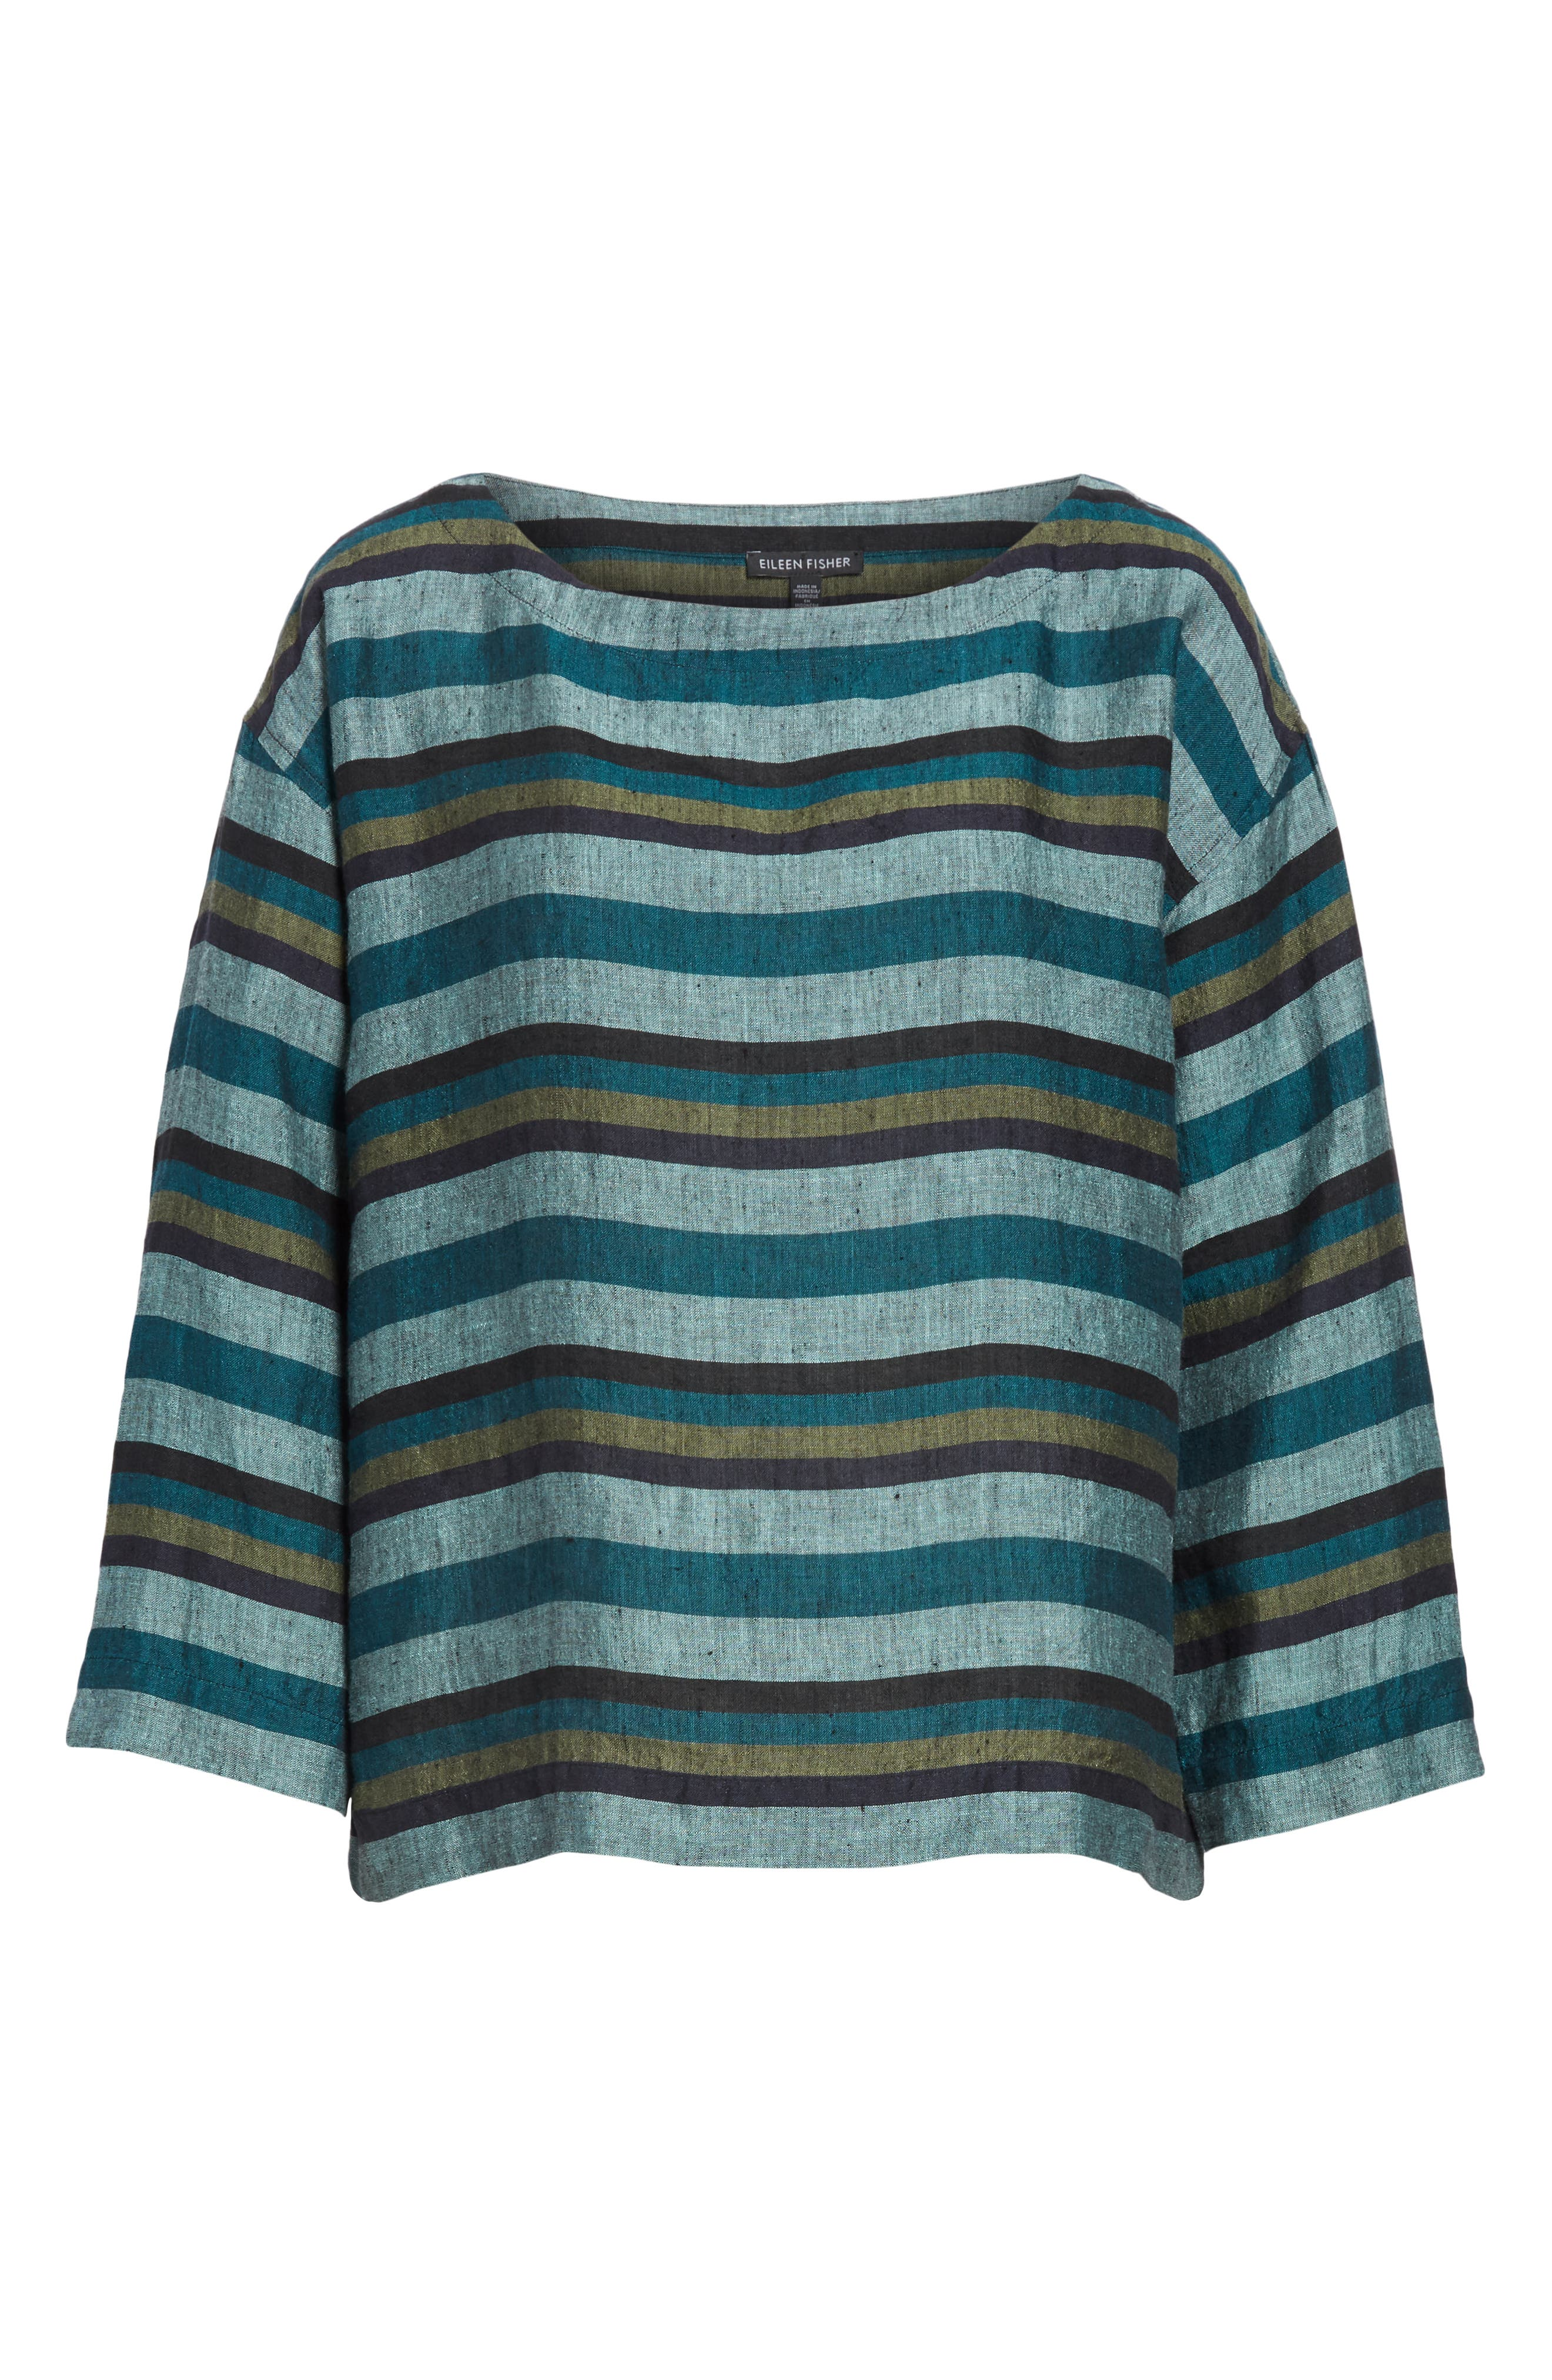 Stripe Organic Linen Top,                             Alternate thumbnail 6, color,                             TEAL